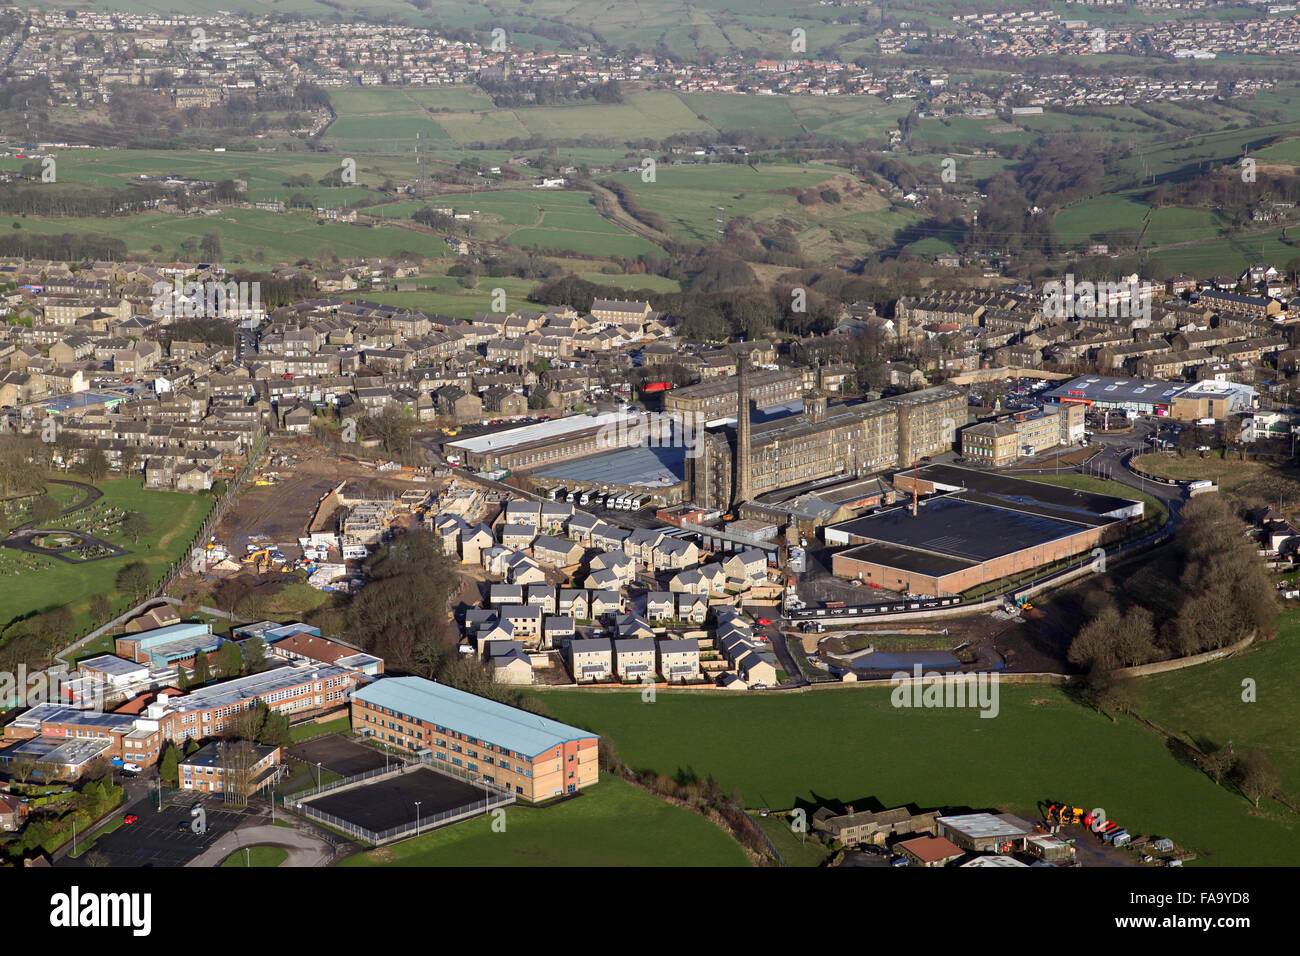 aerial view of Blackdyke Mills at Queensbury, Bradford, West Yorkshire, UK - Stock Image